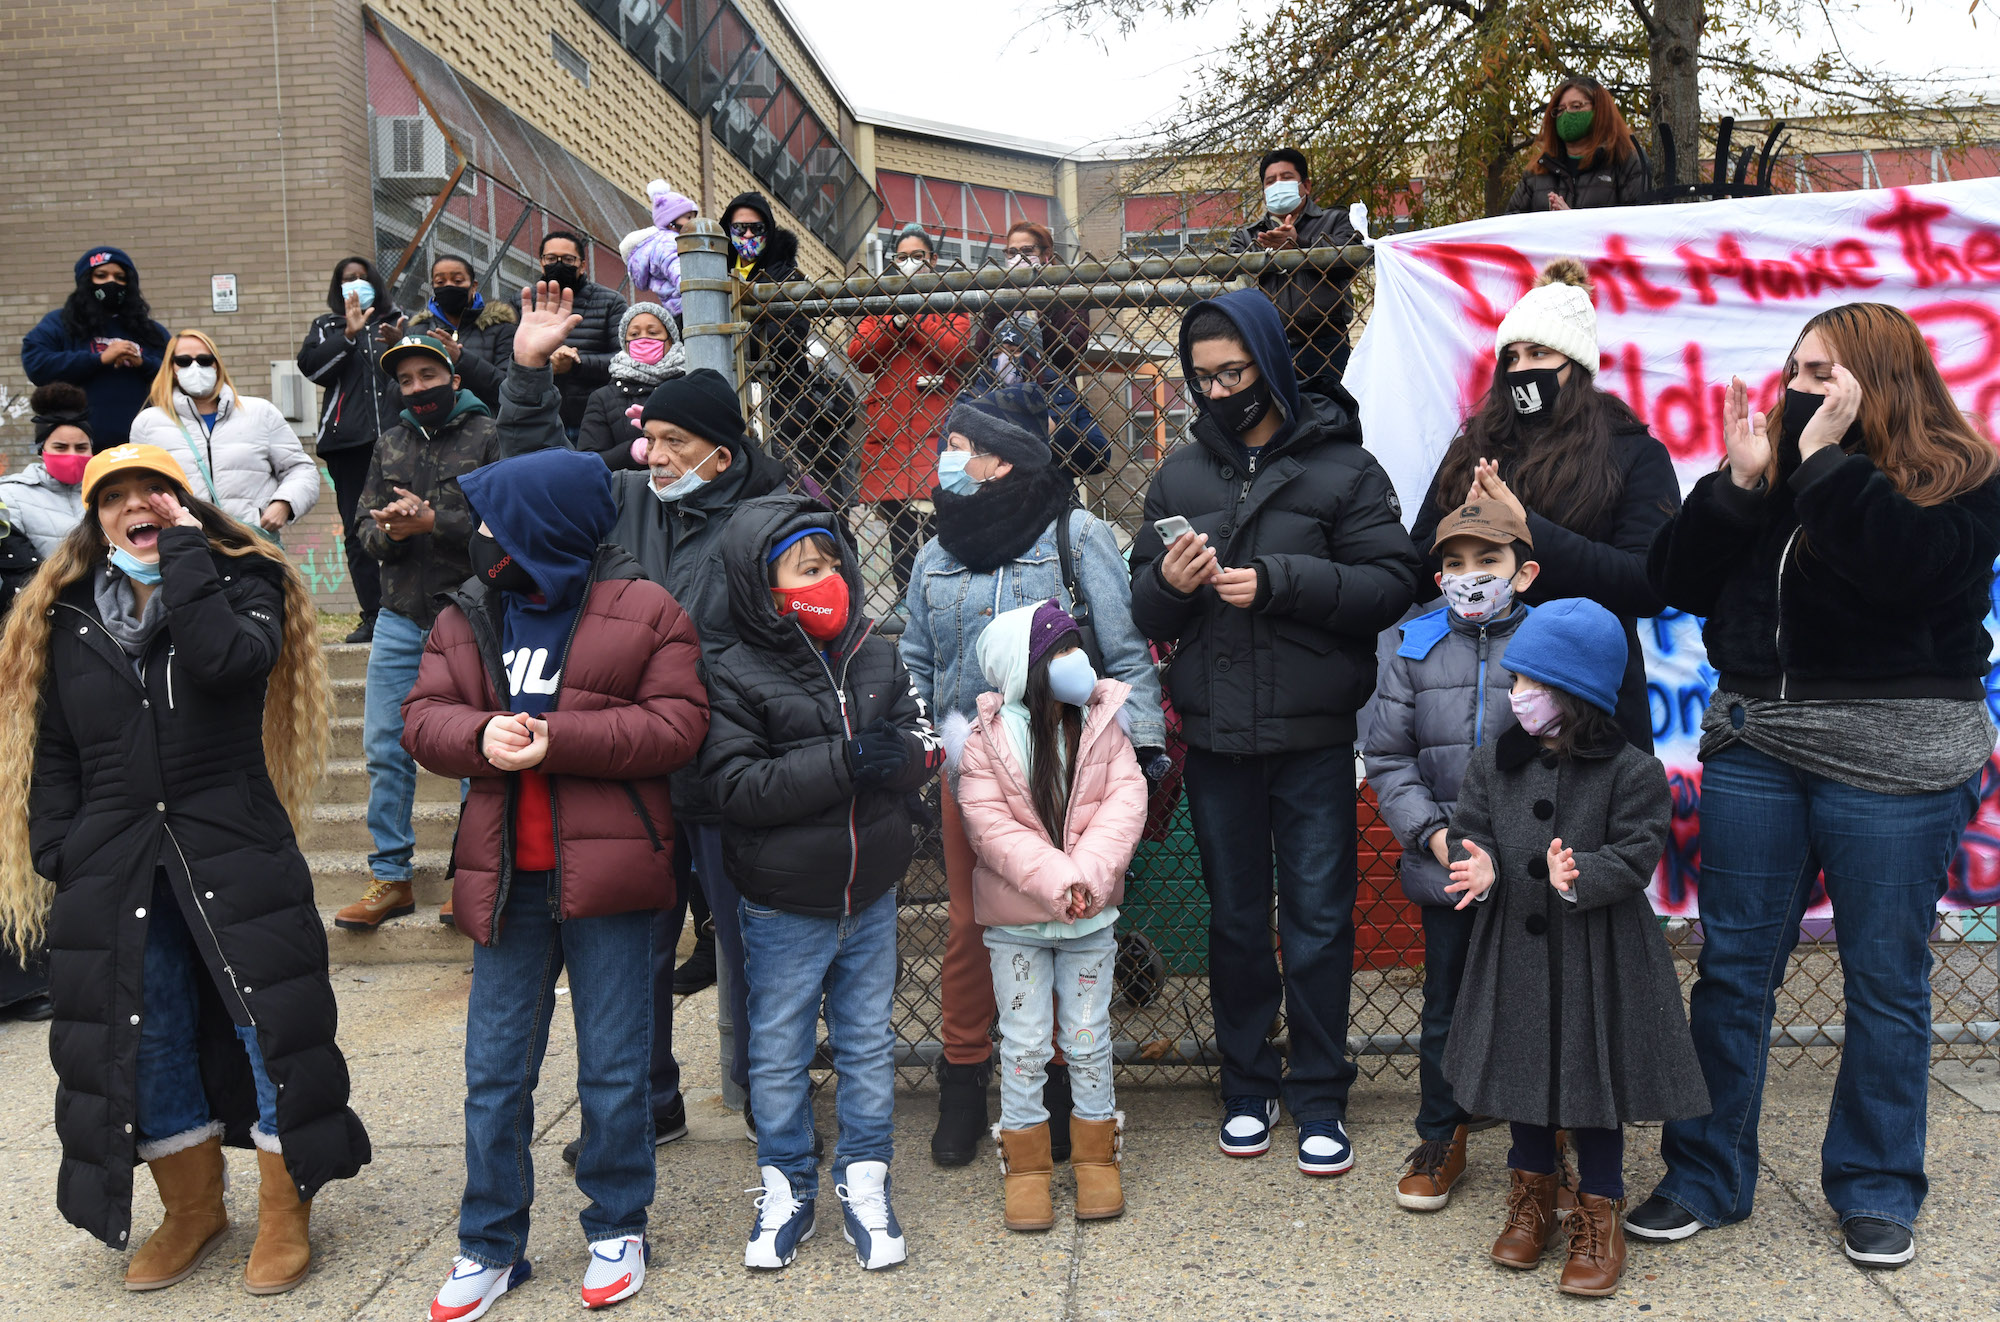 Maria Montero, left, leads a protest against school closures at Wiggins School